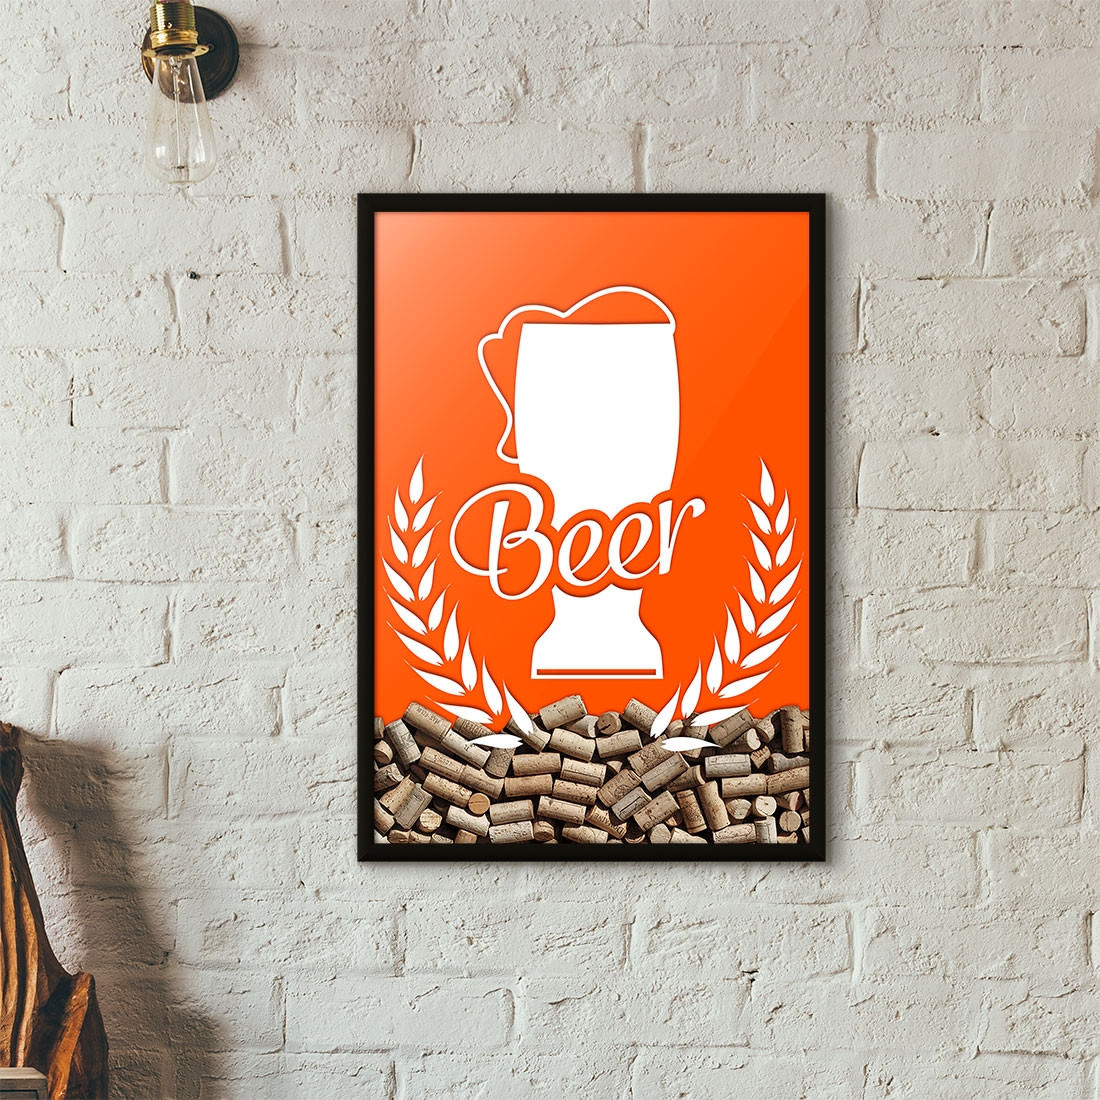 Quadro Porta Tampinhas de Cerveja - Tulipa Beer - Laranja